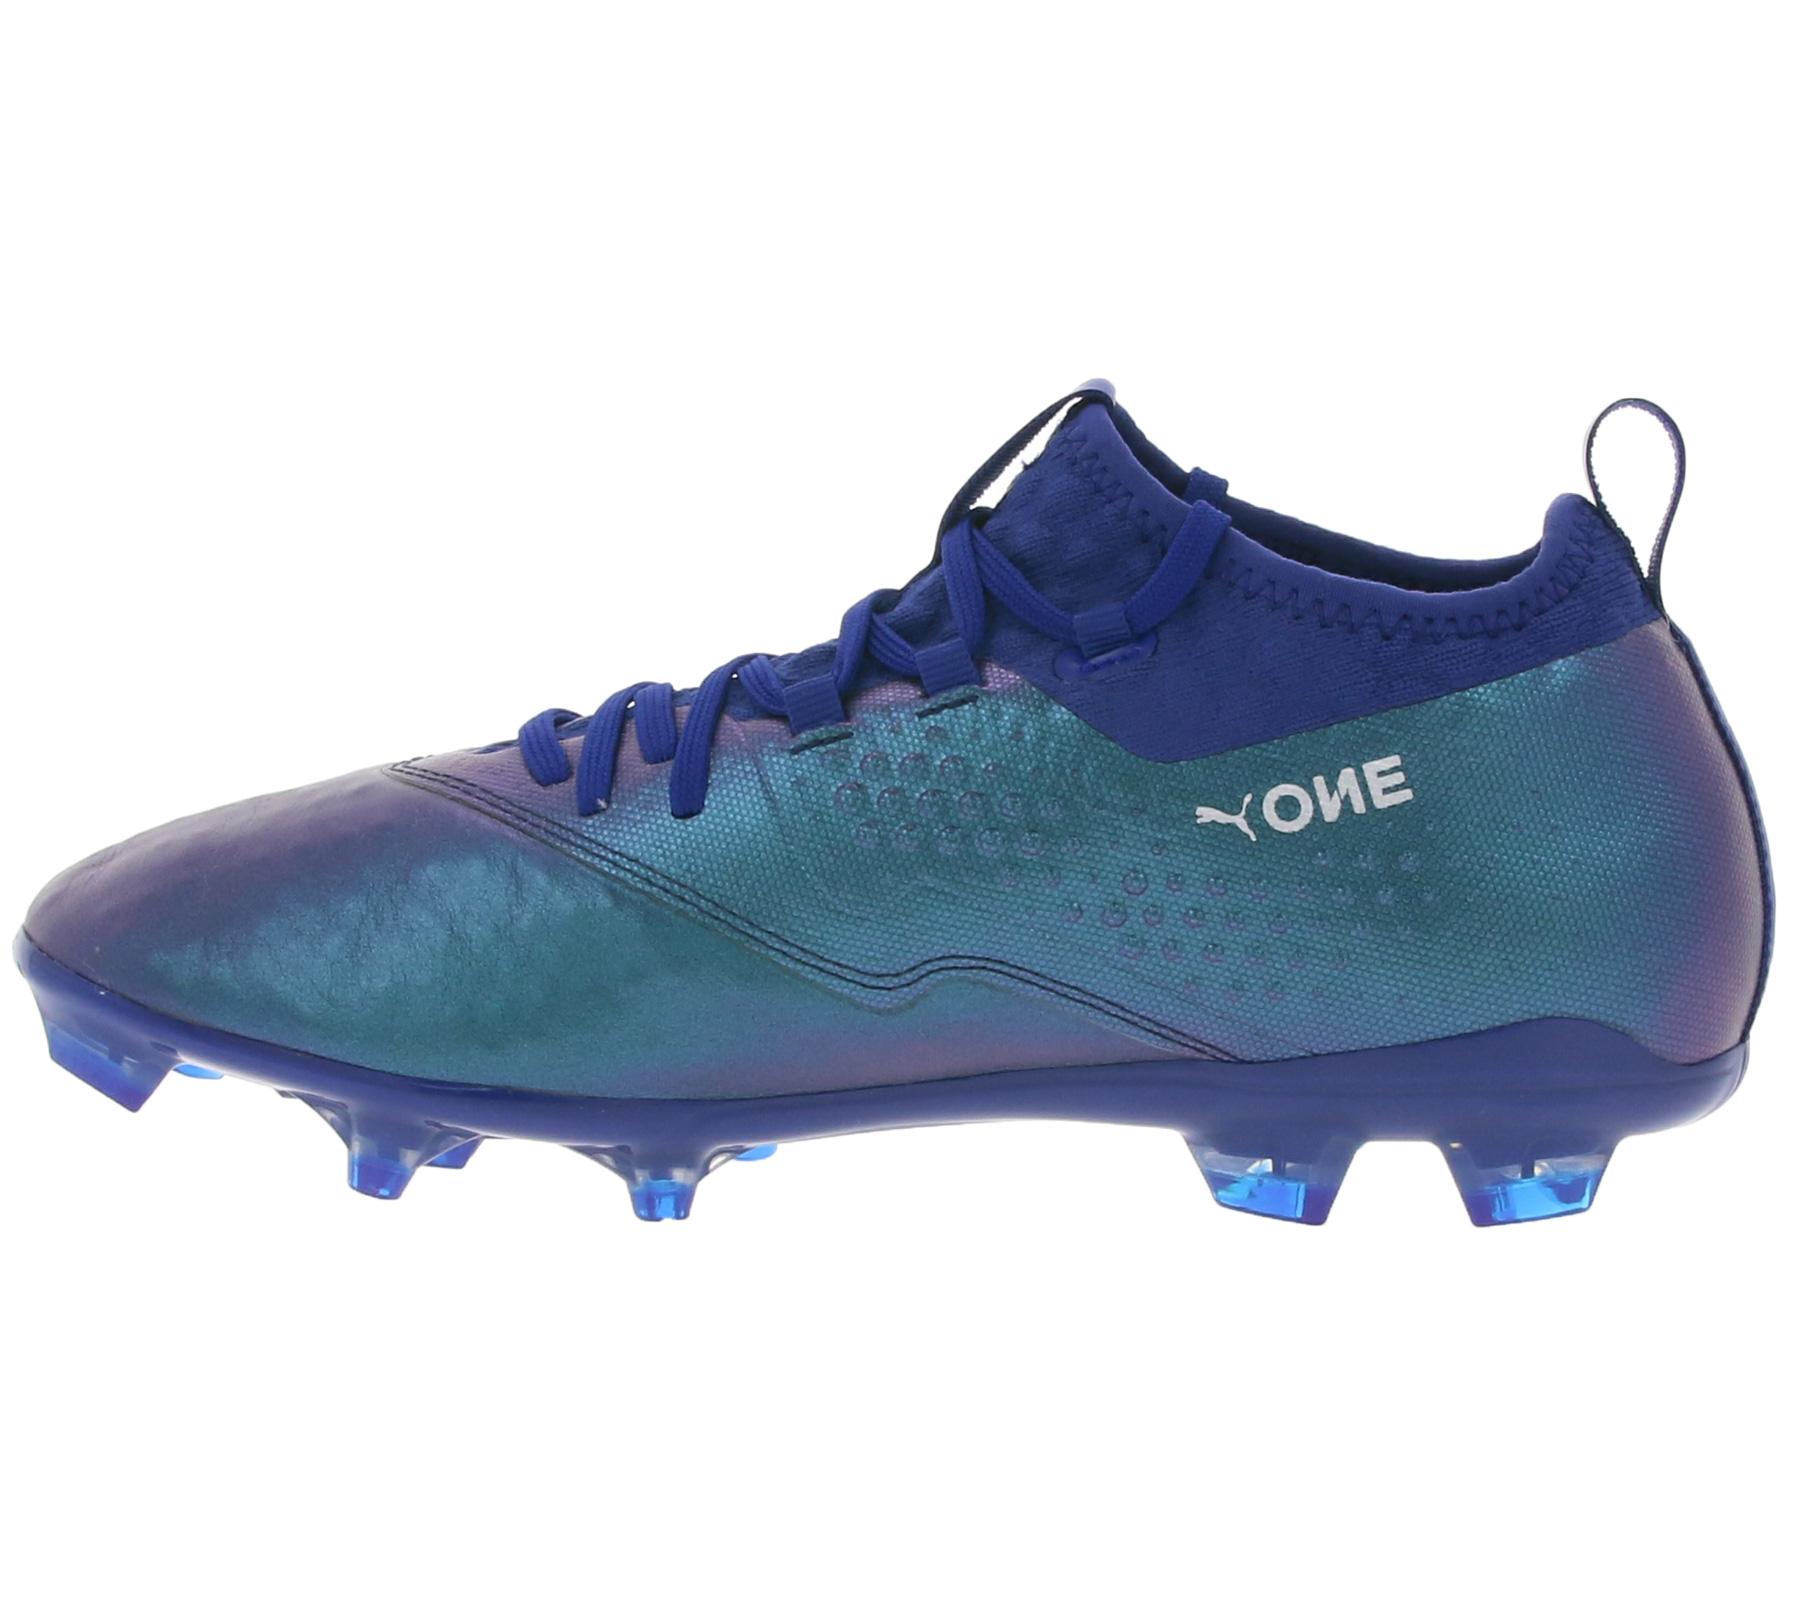 PUMA Fußballschuhe bequeme Nocken Schuhe ONE 2 Leather FG Blau